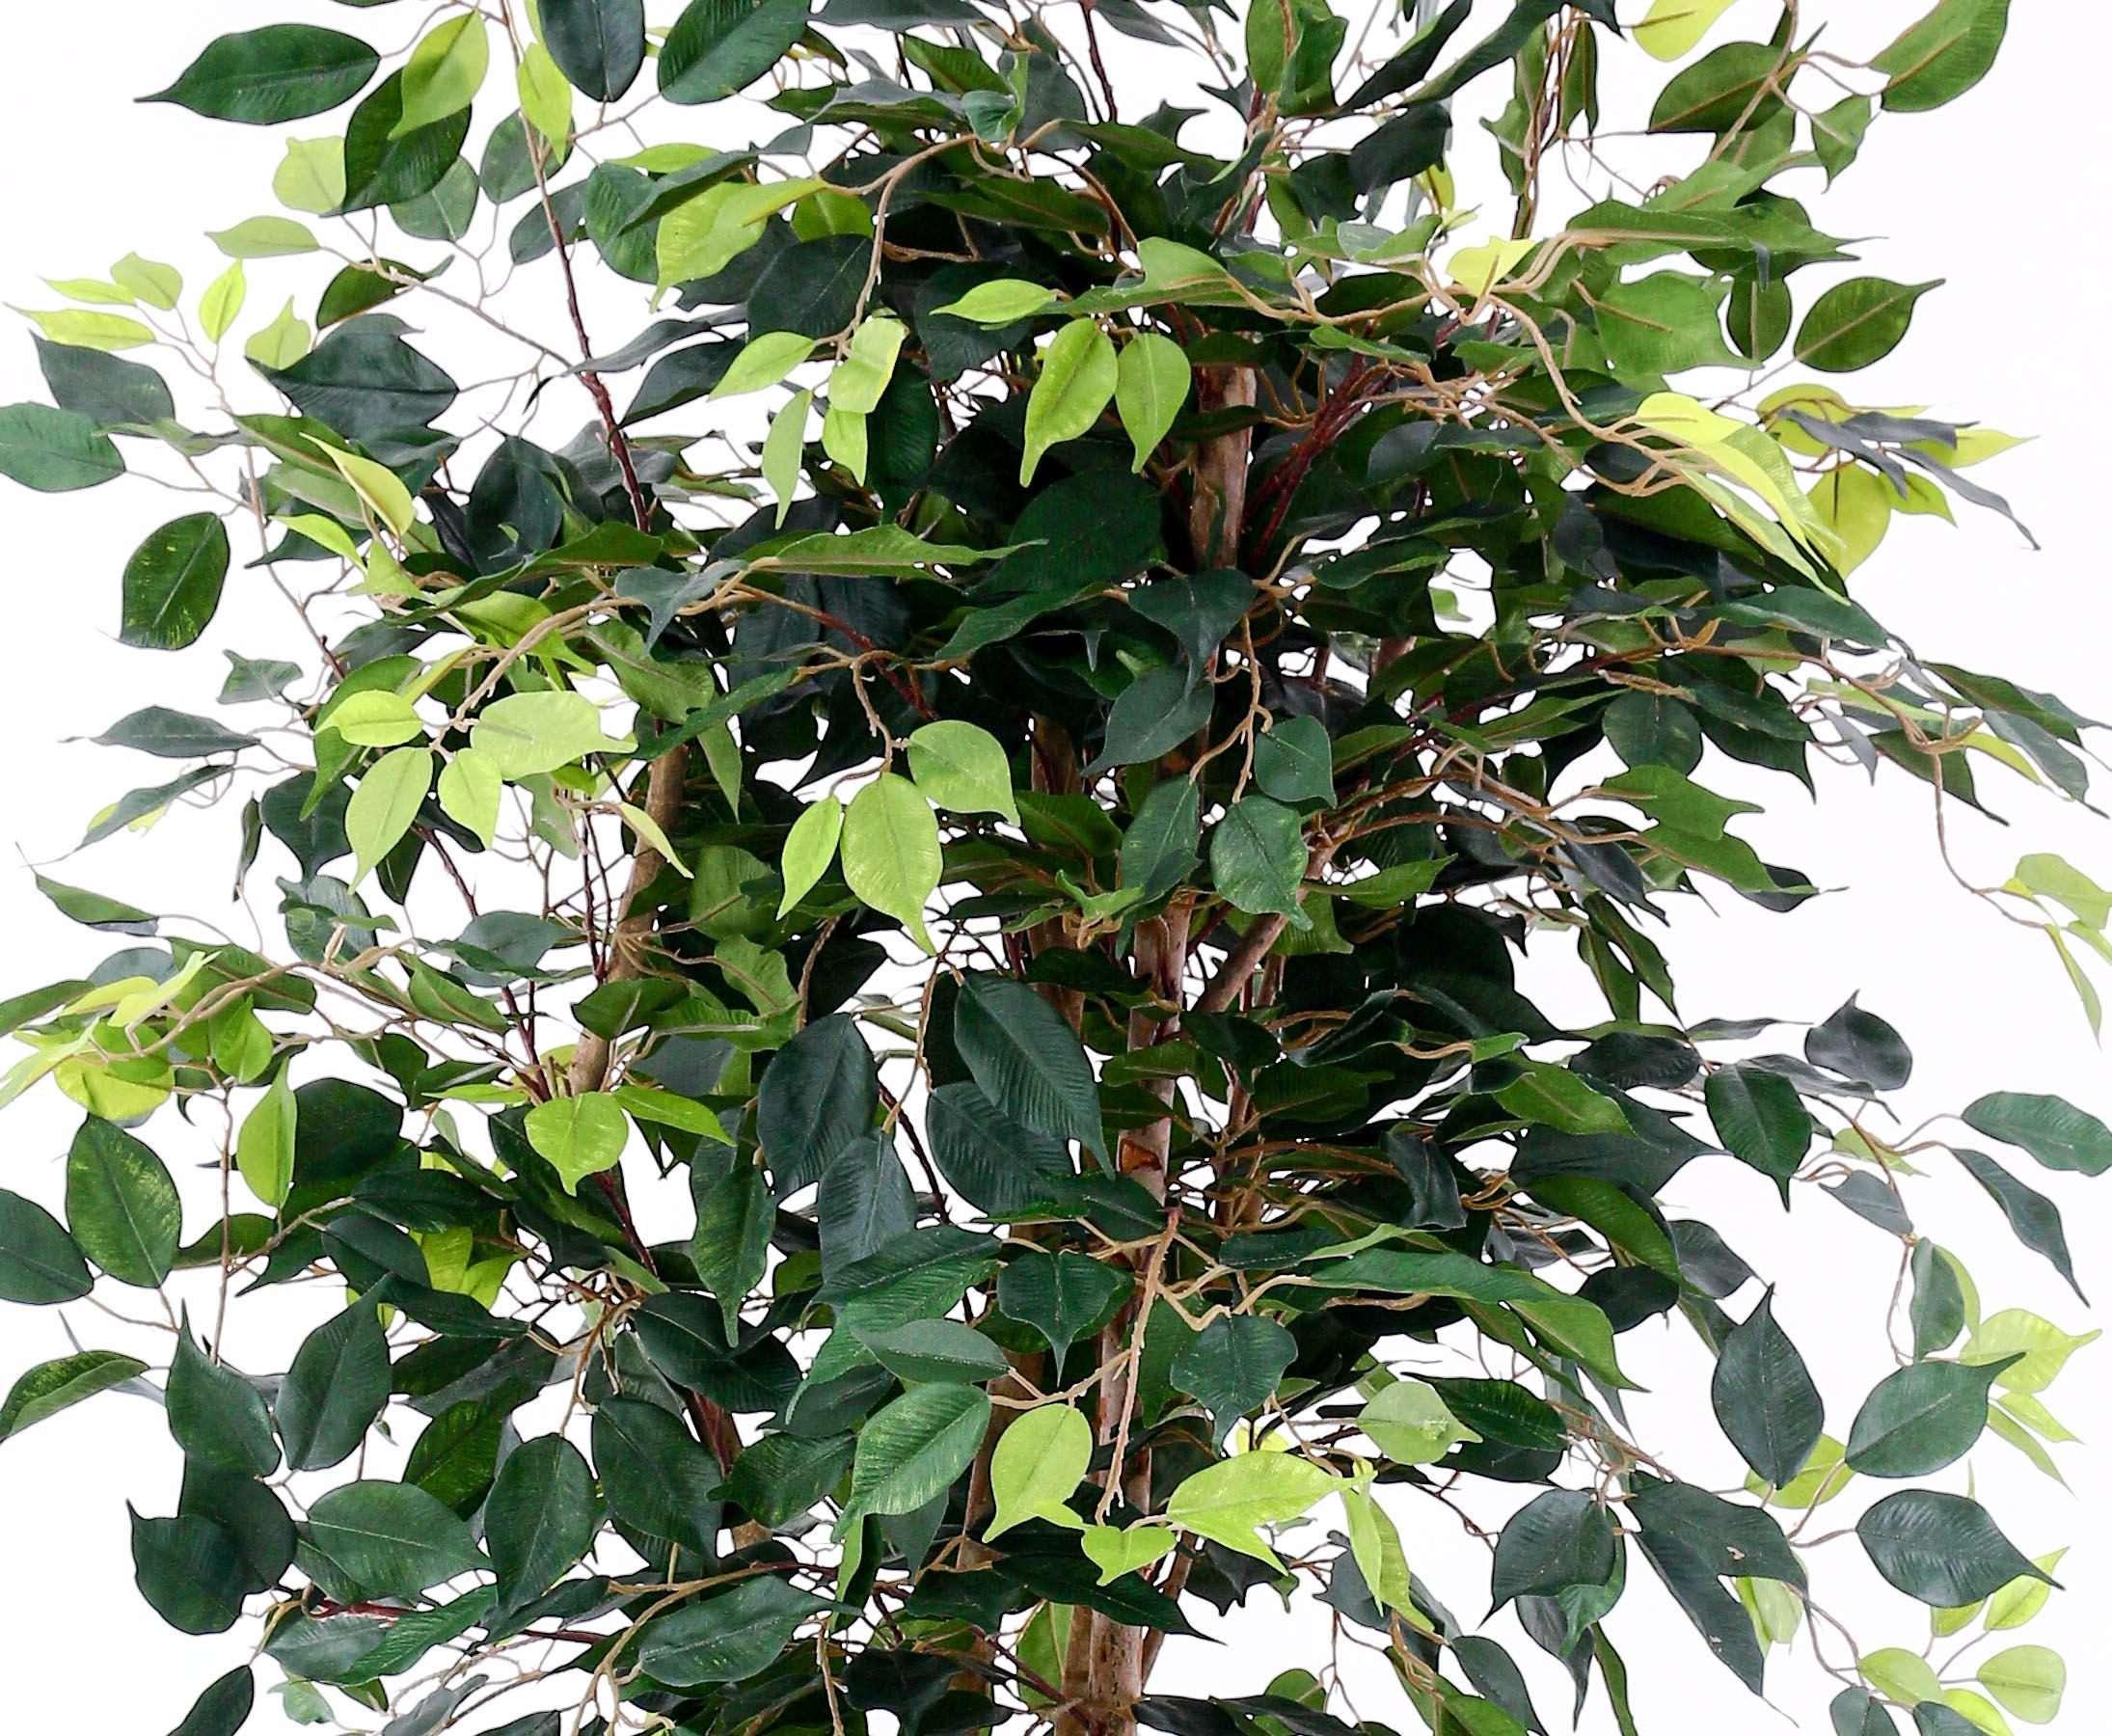 Kunstpflanze Dekobaum Zitronenbaum 120 cm Kunstbaum